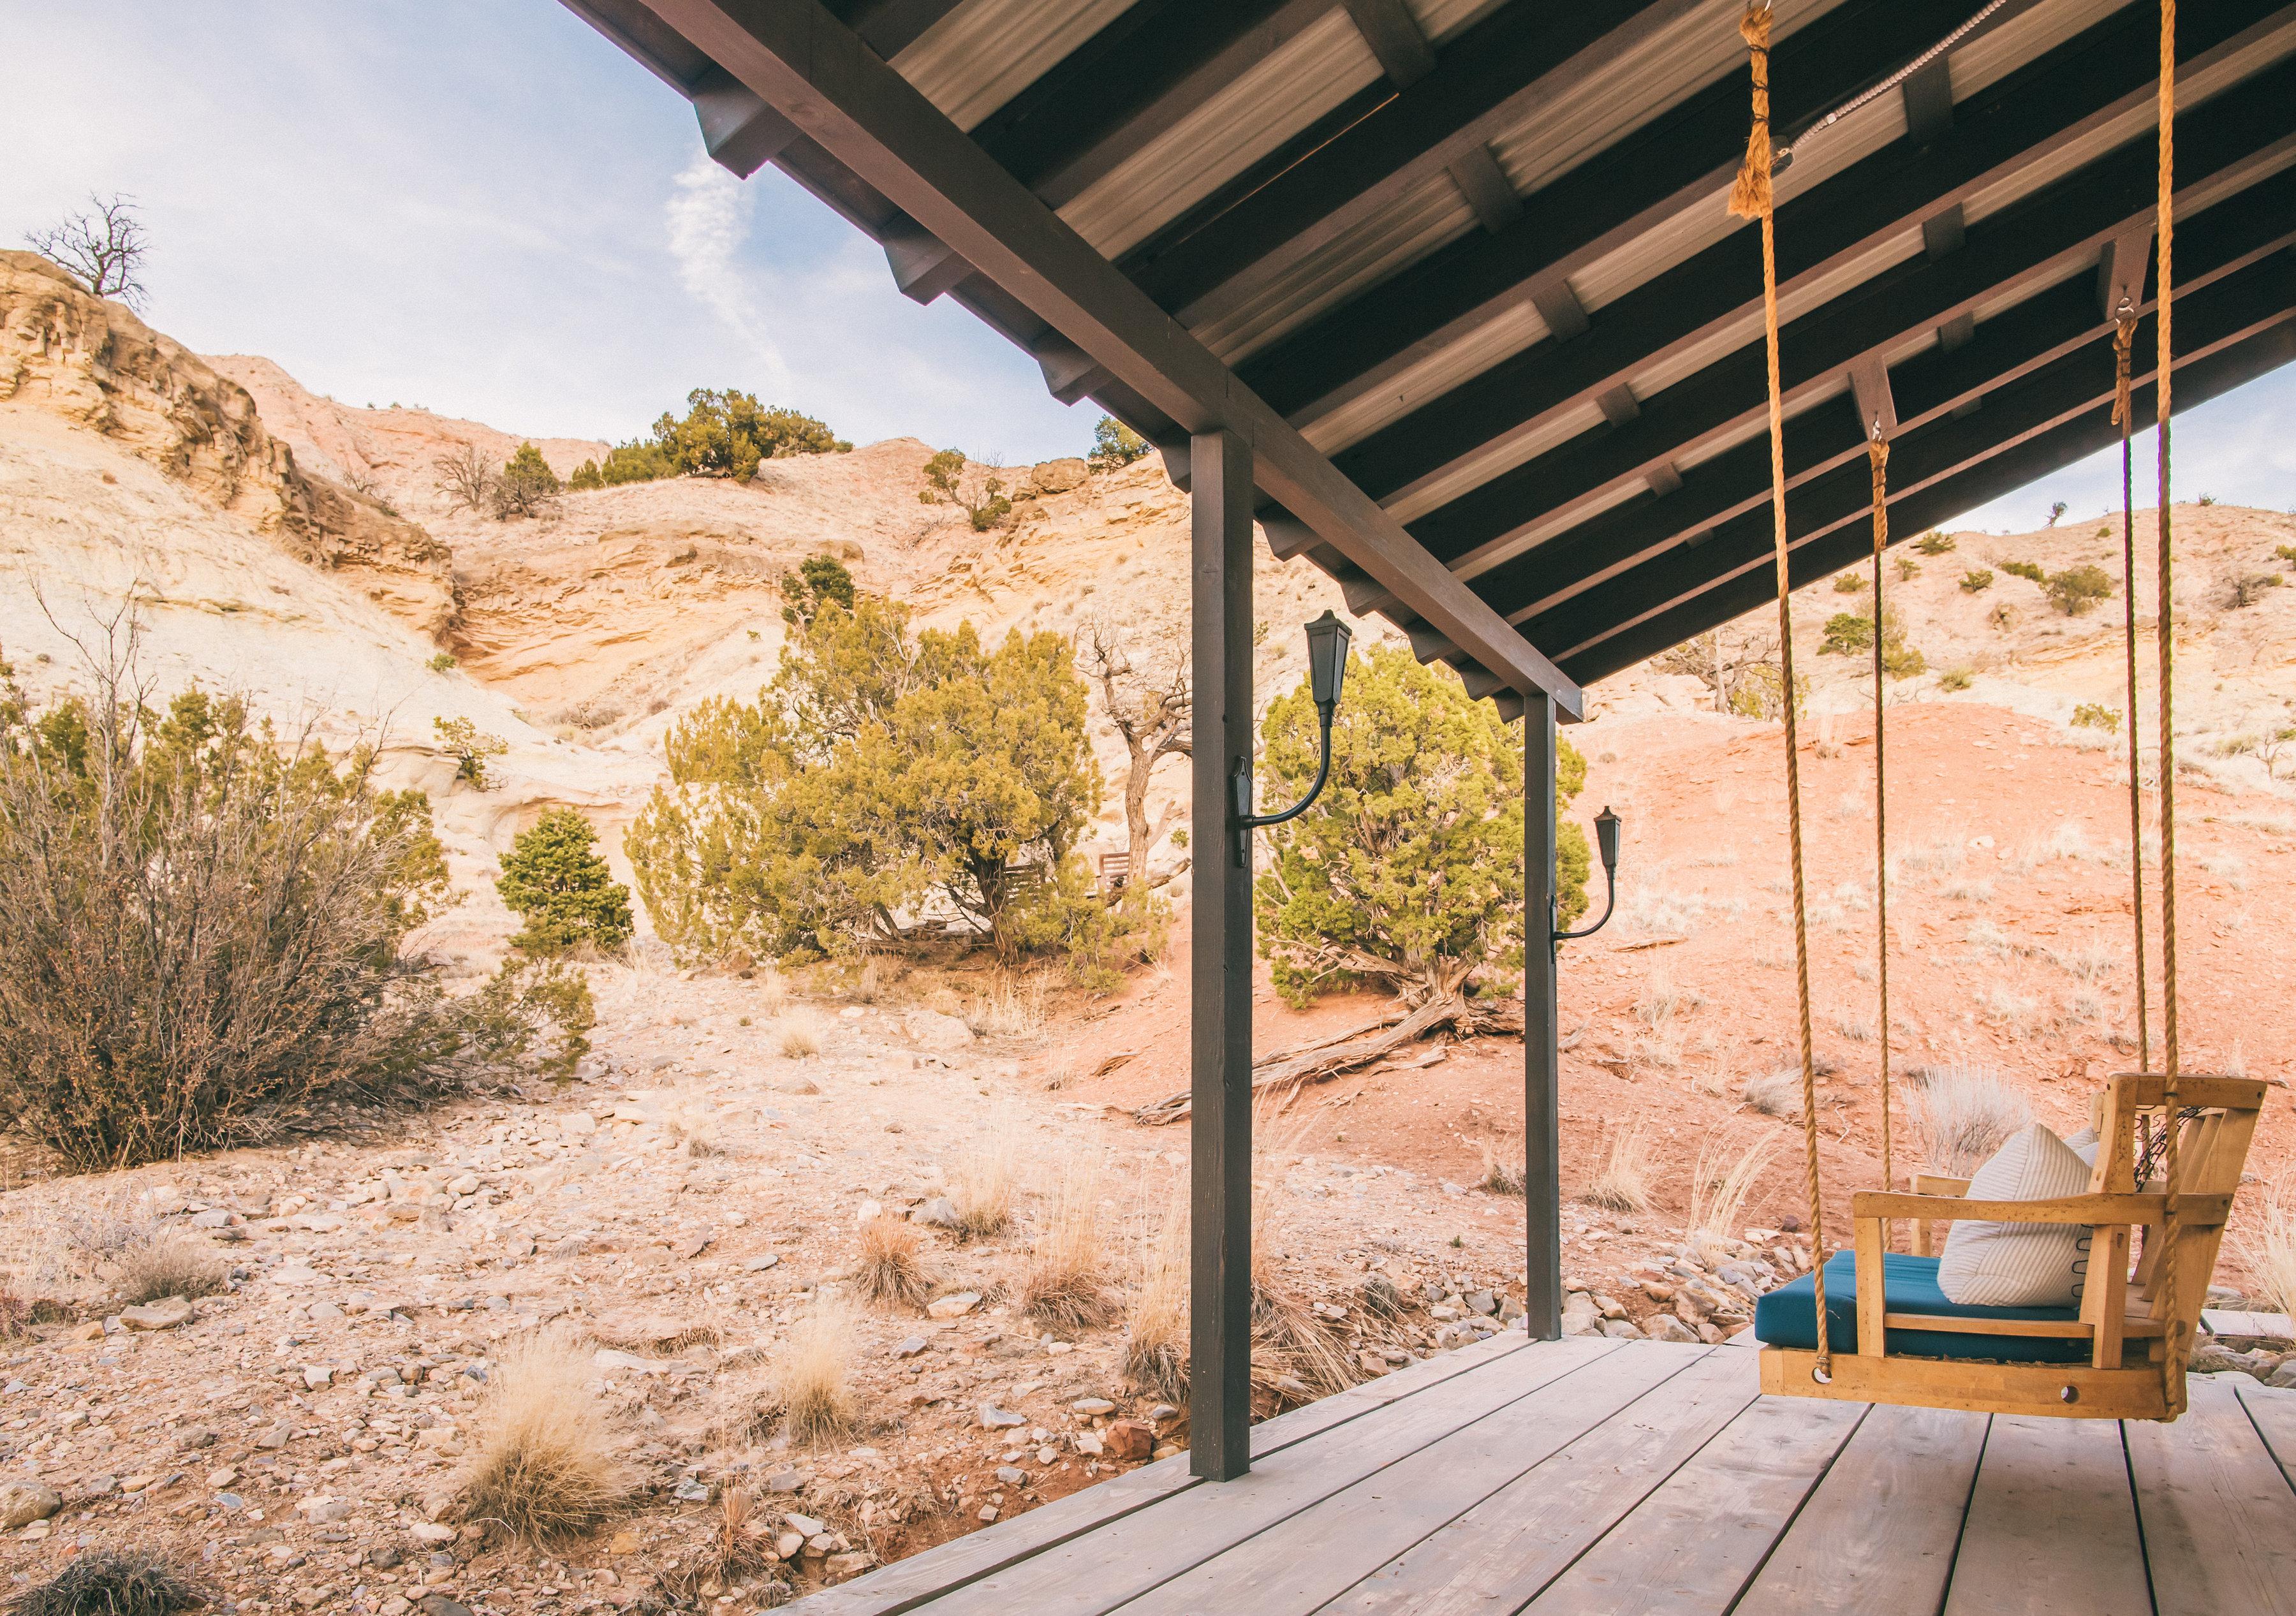 New Mexico Retreat Facility Lodging